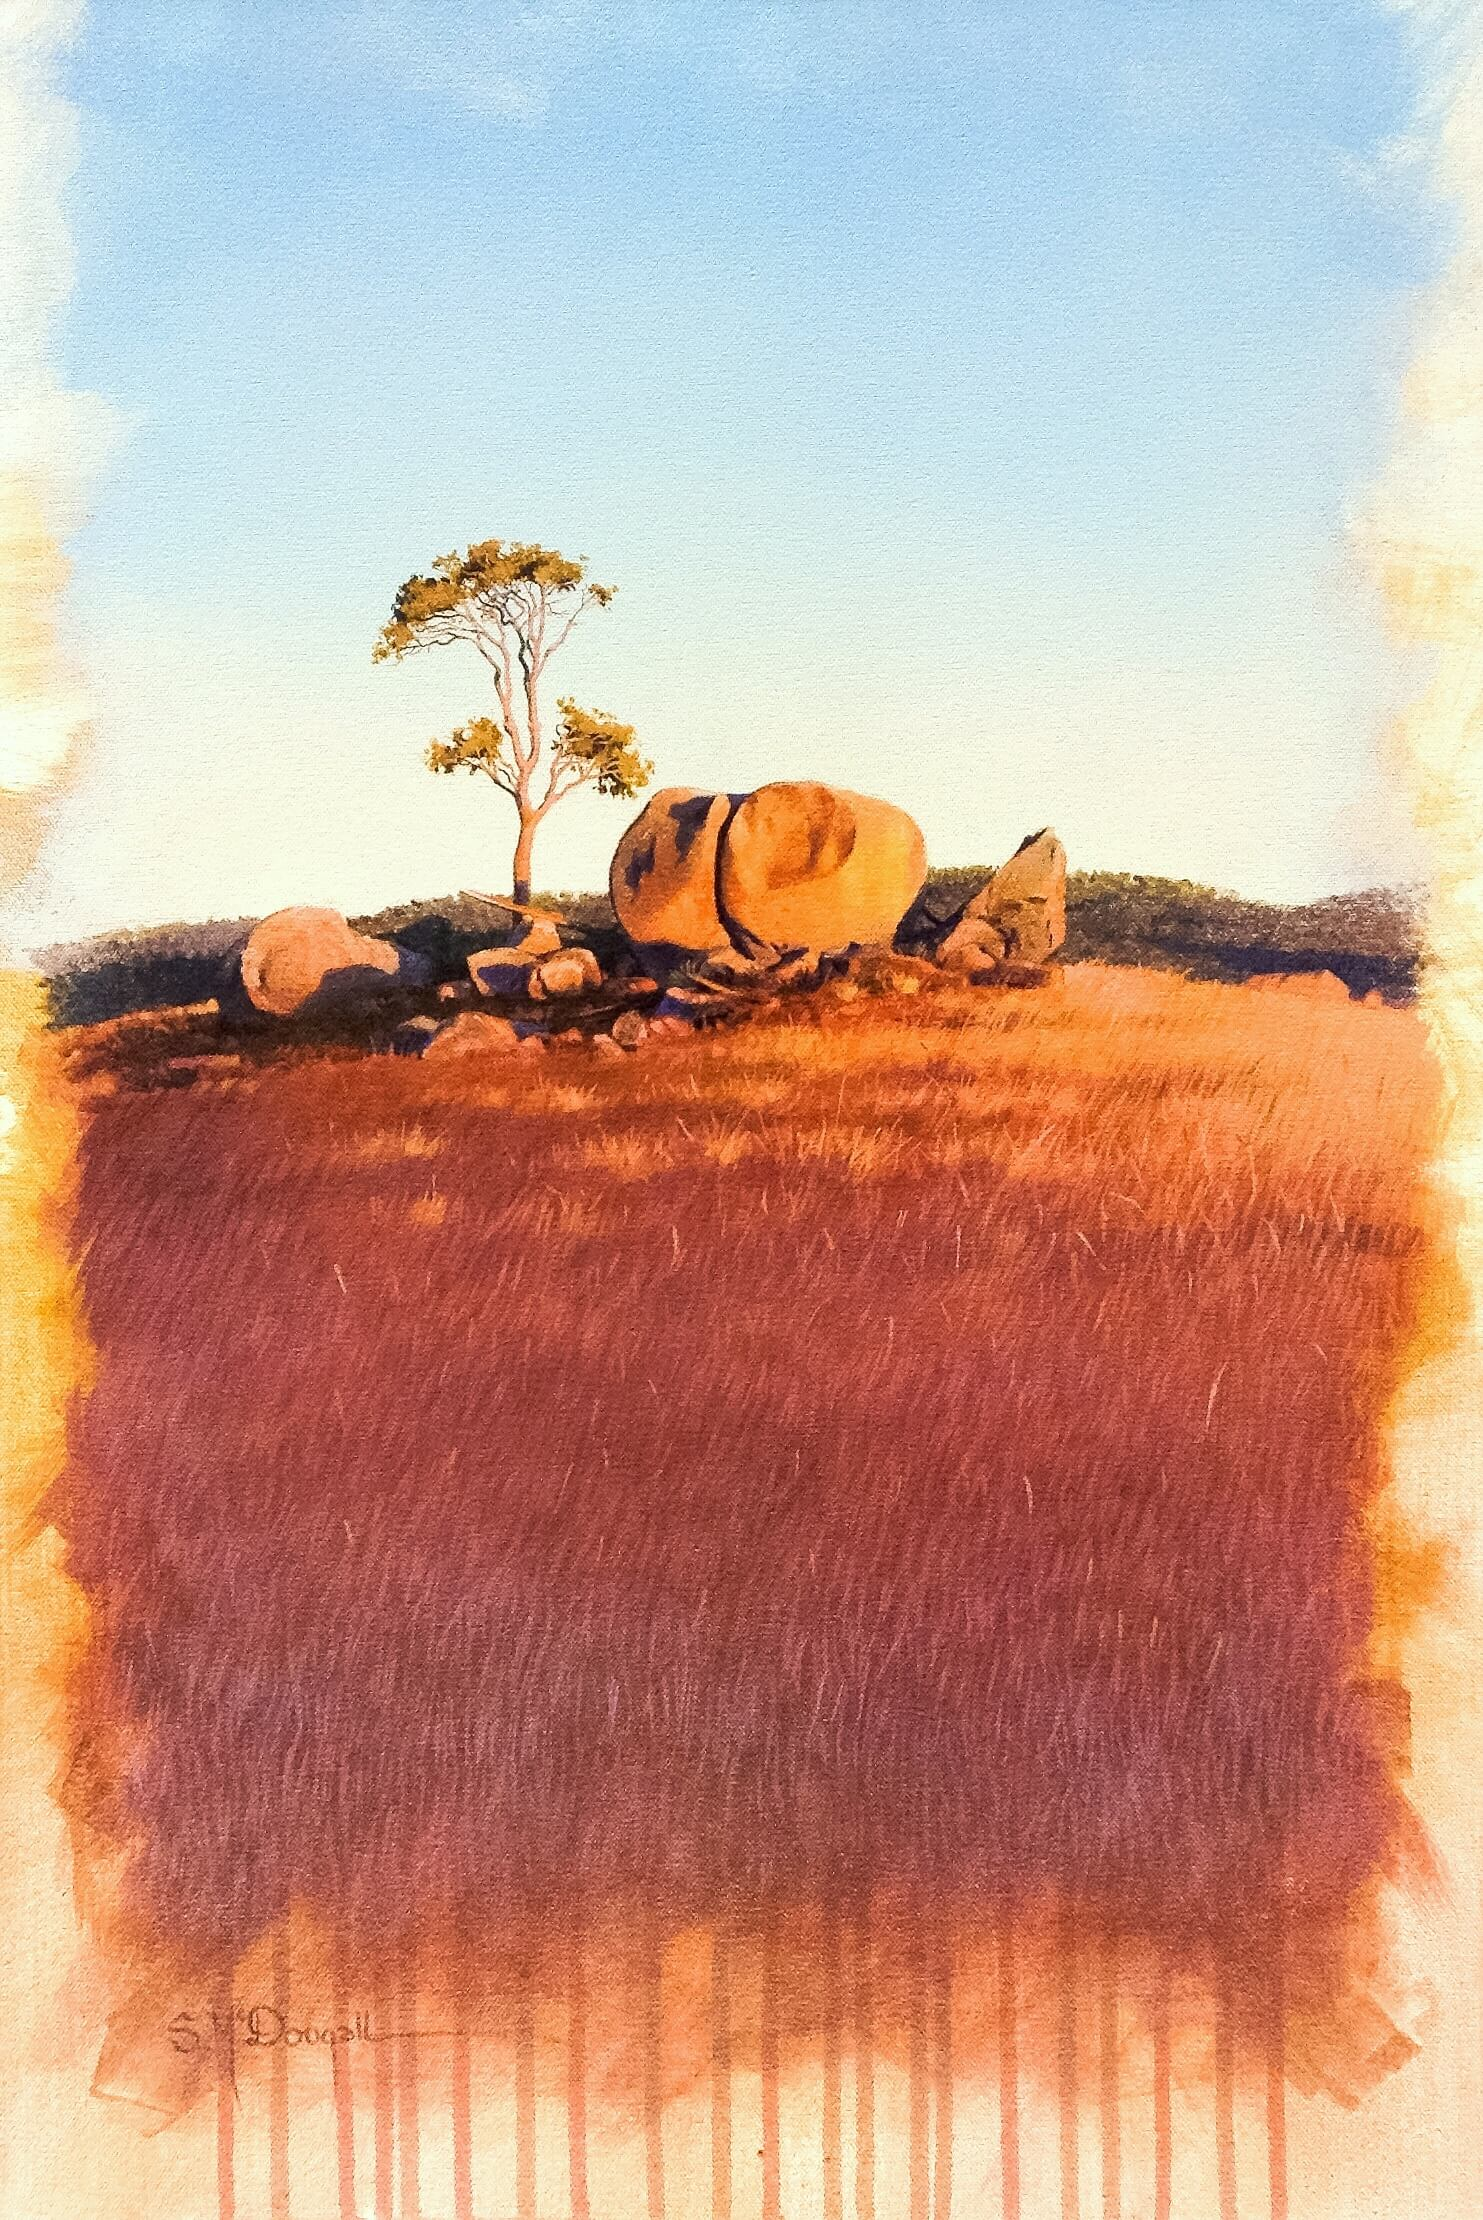 scott-mcdougall-morning-light-tenterfield-61cm-x-41cm-acrylic-on-canvas-4500